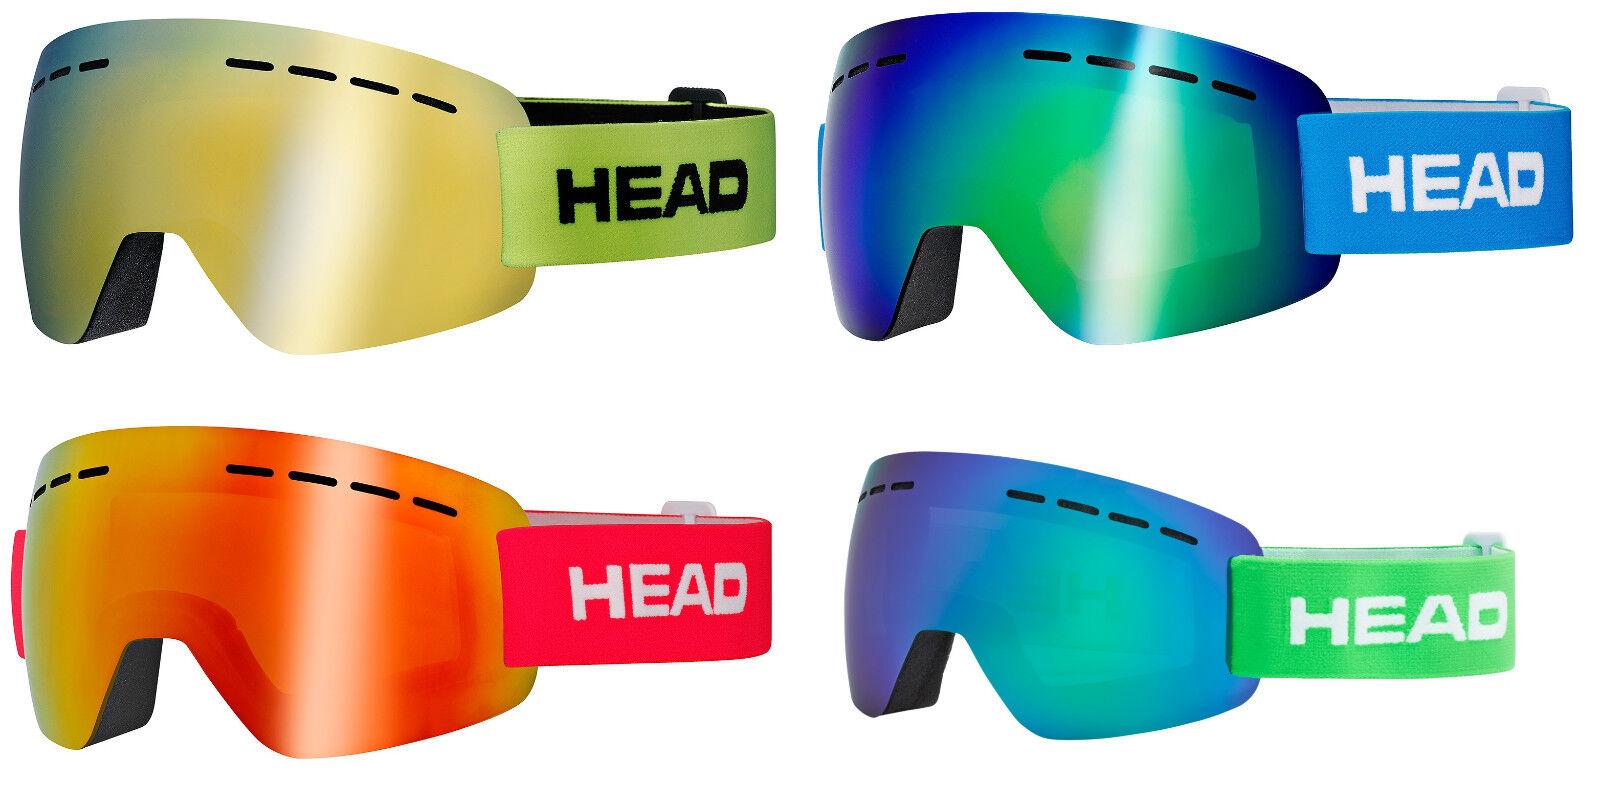 HEAD SOLAR SOLAR HEAD FMR Skibrille Snowboardbrille Collection 2019 - NEU 0f7043